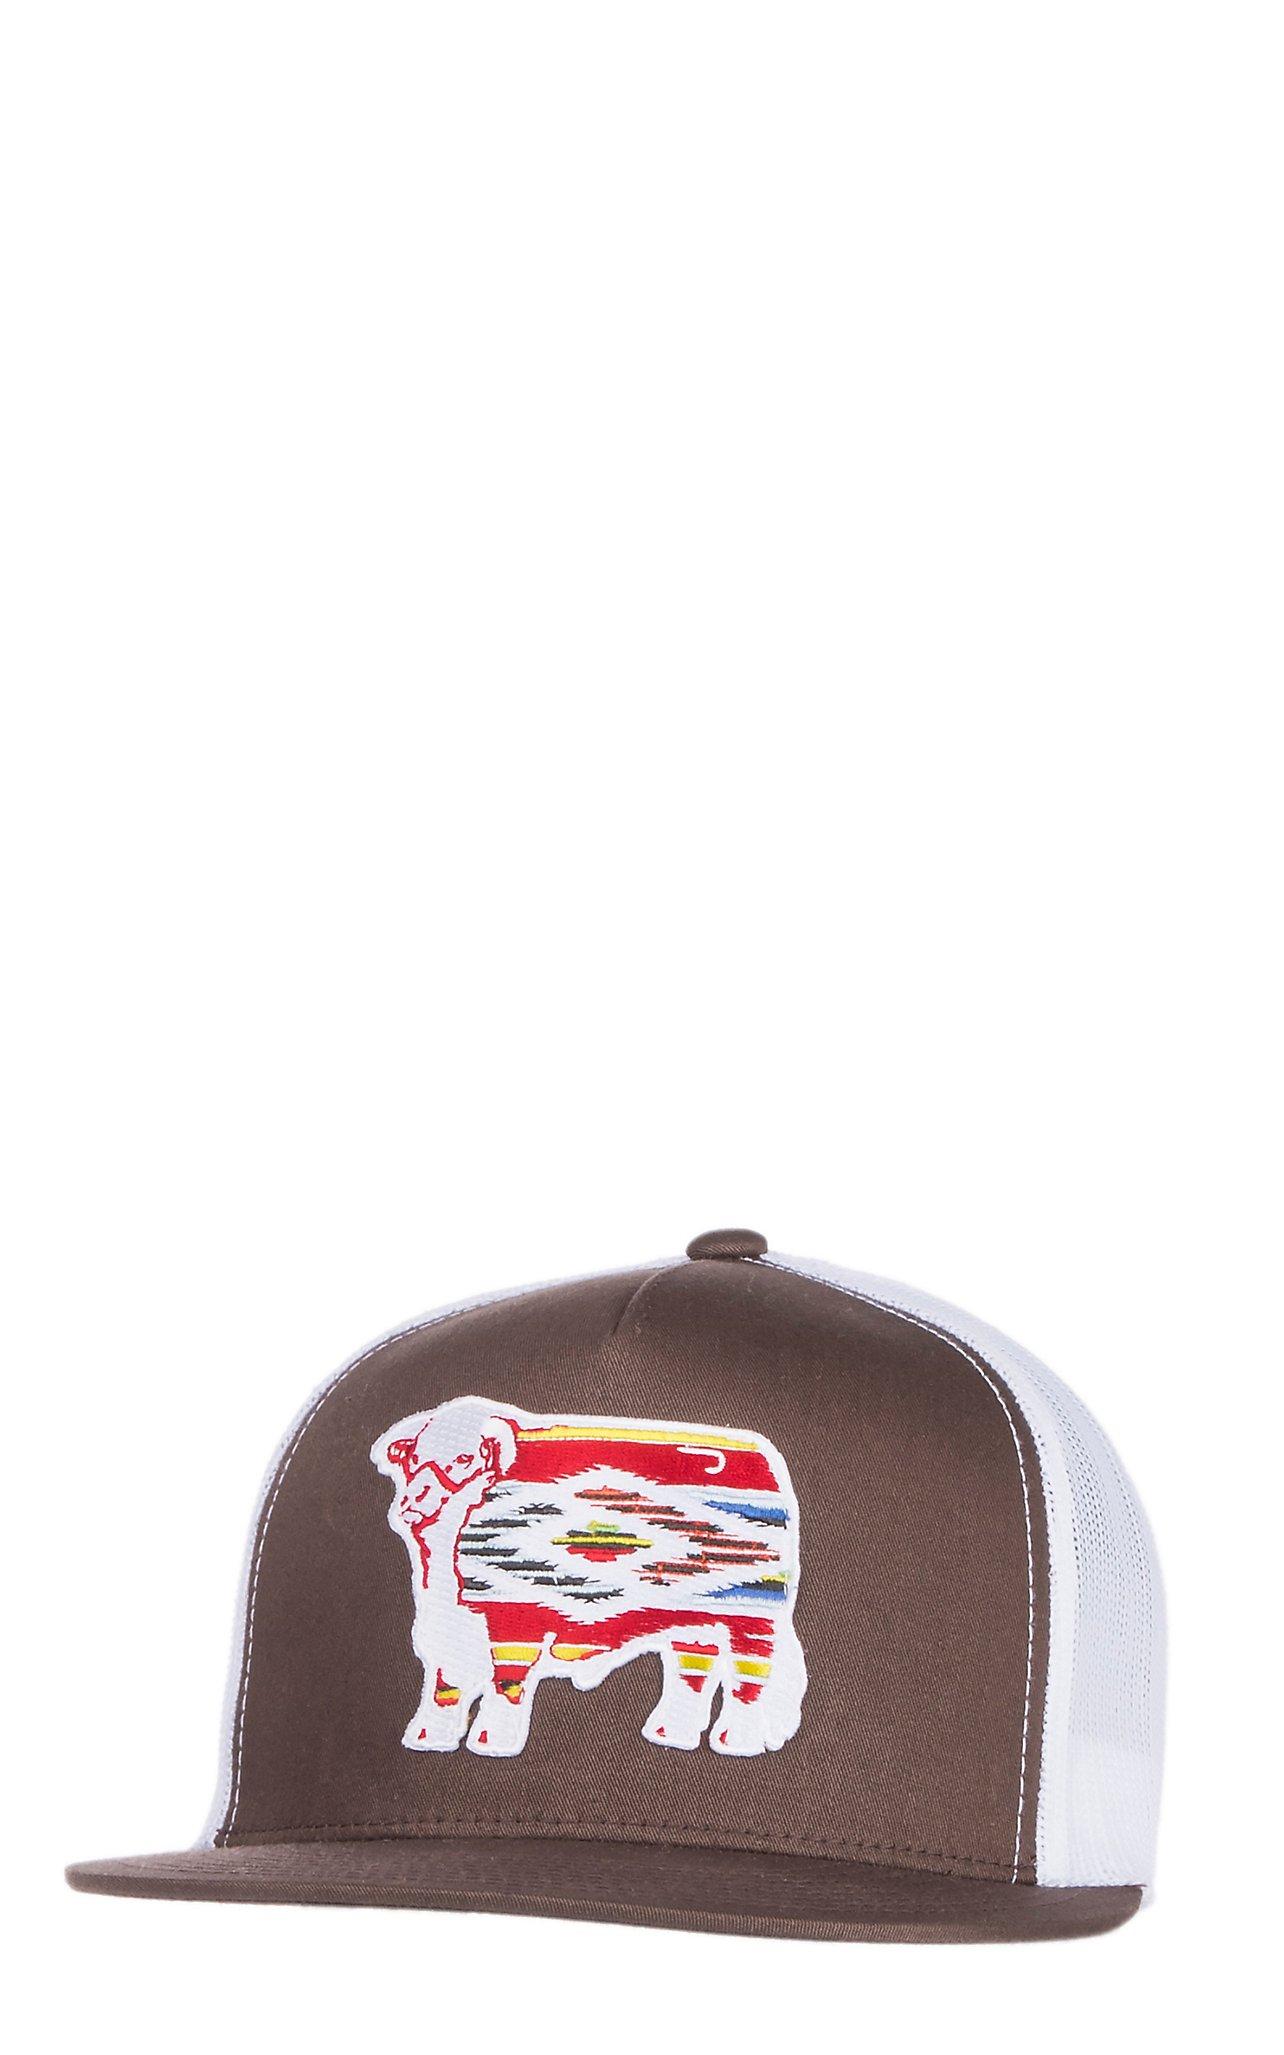 2d883827d6b Lazy J Ranchwear Brown Serape Elevation Patch Snap Back Cap